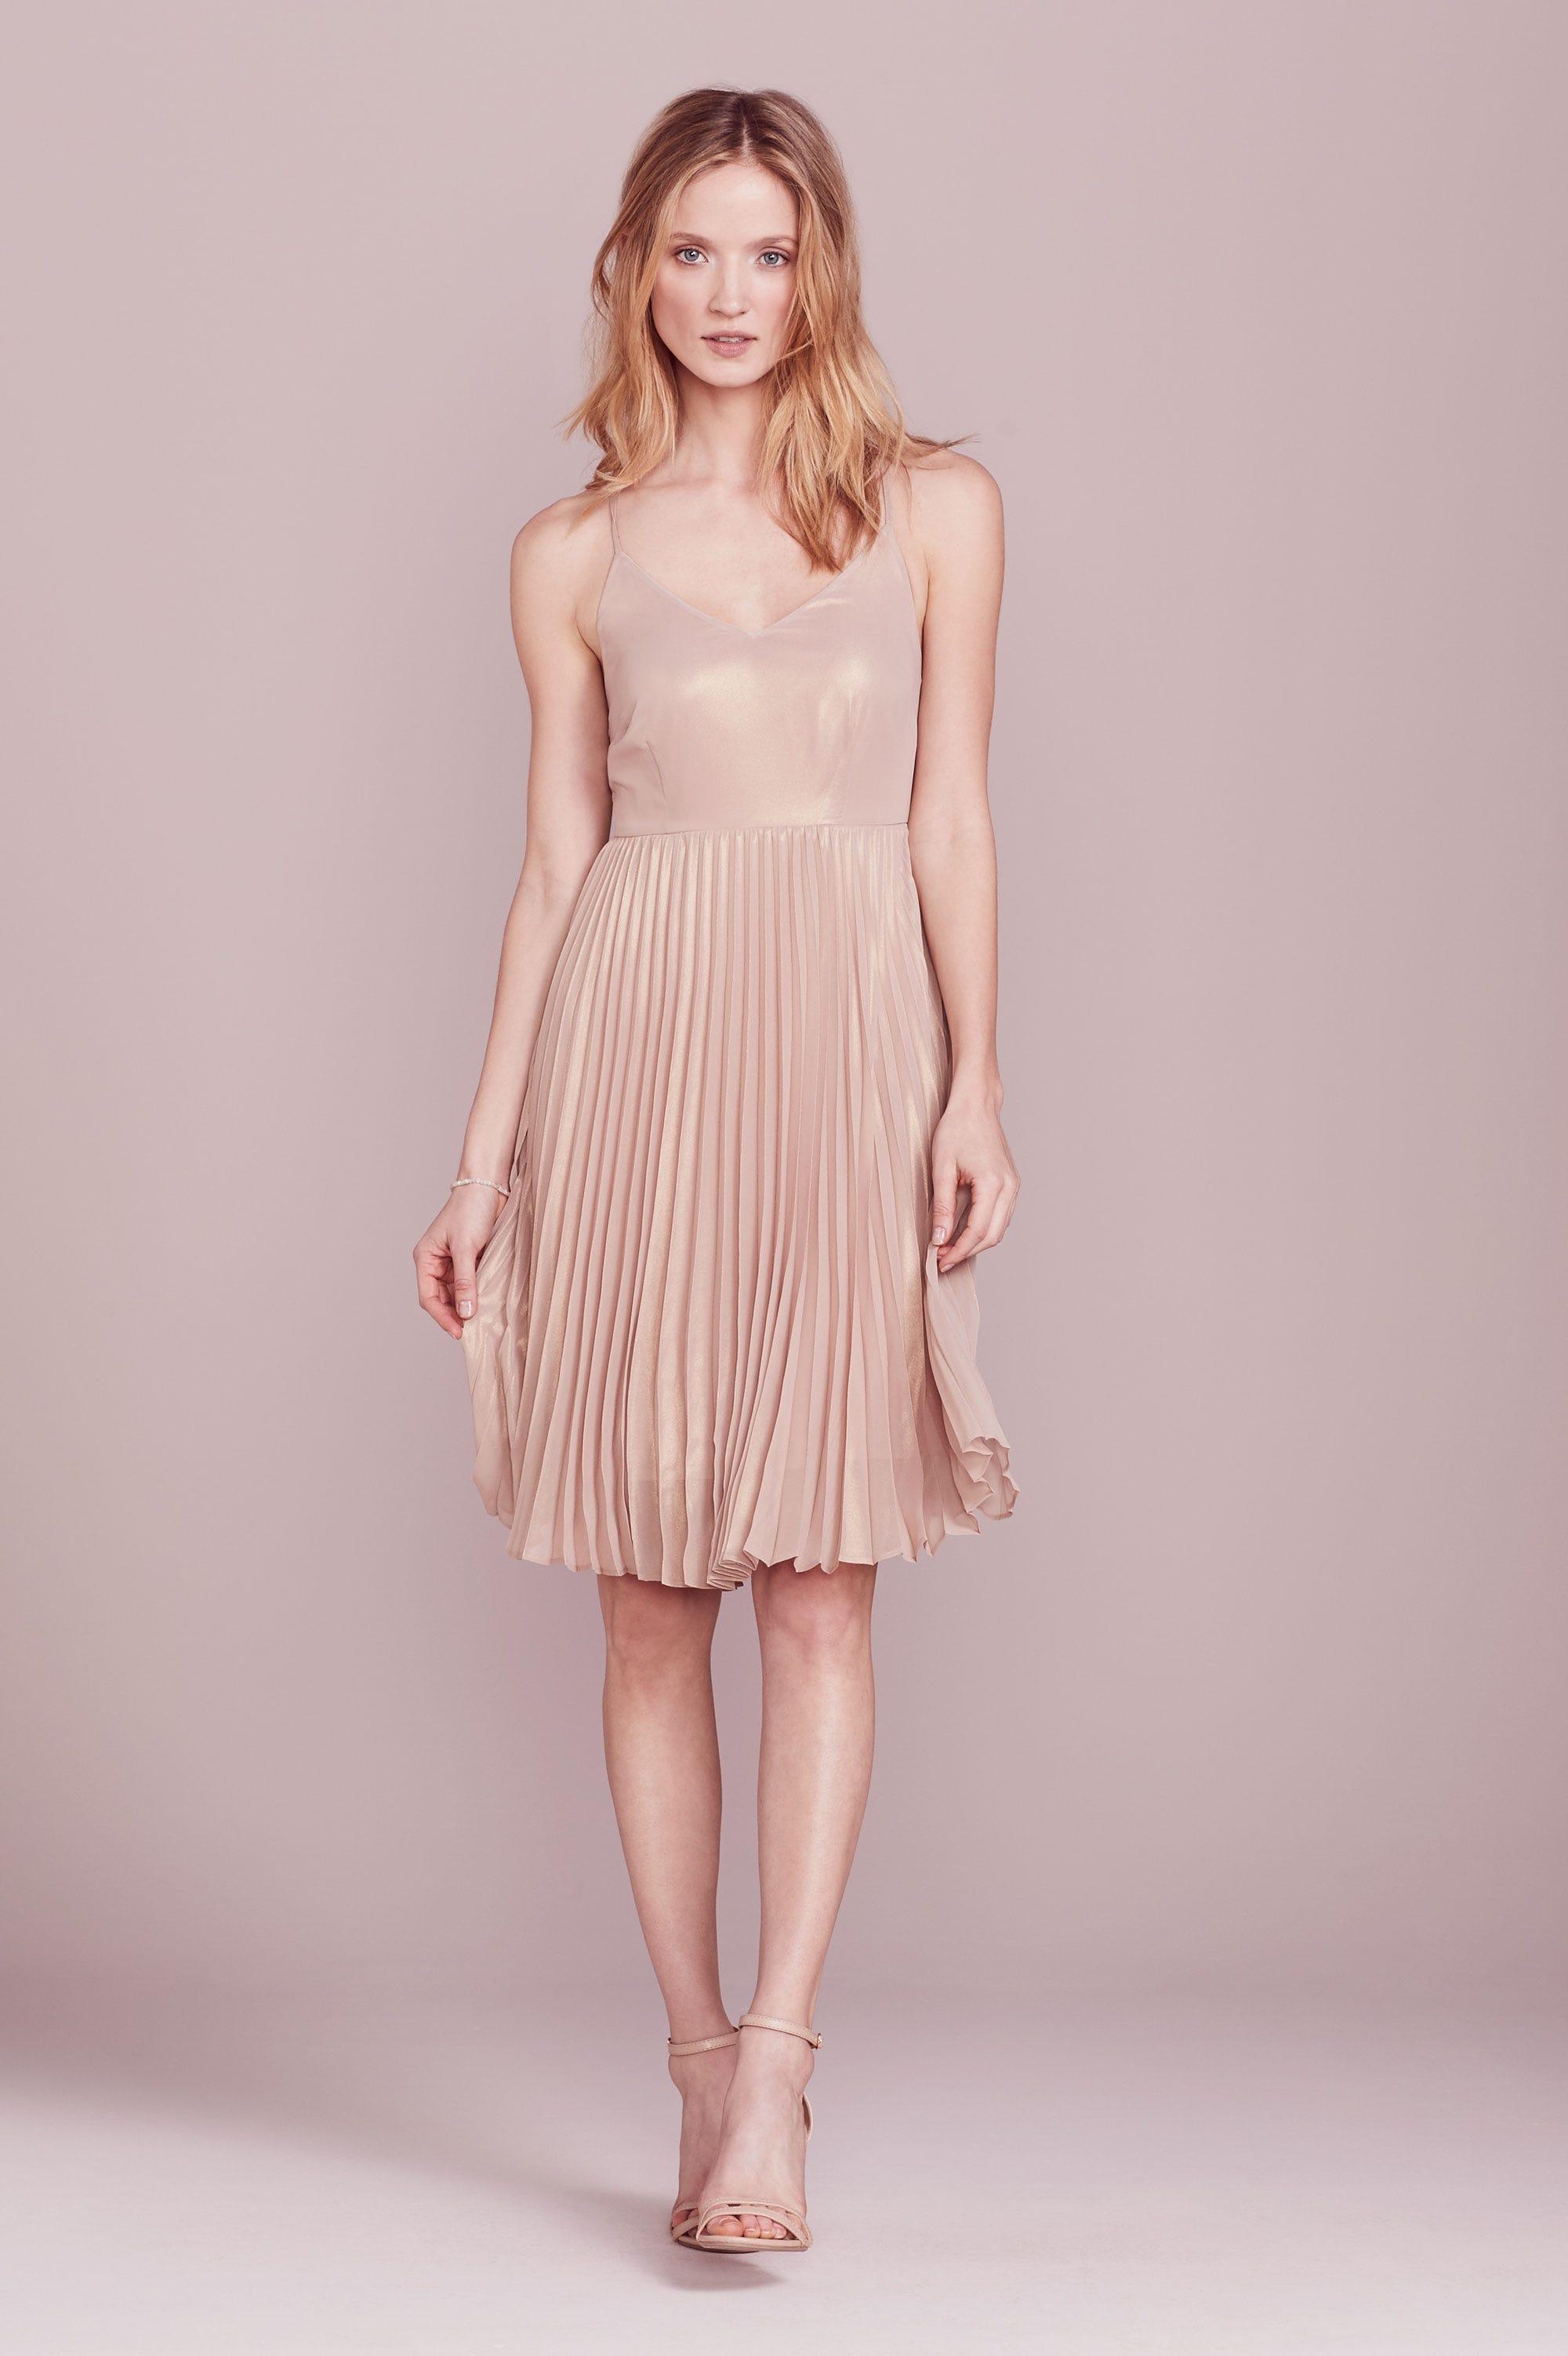 5fa3edc49dffb Lauren Conrad Kohls Line Prom Dress Date Night Outfits